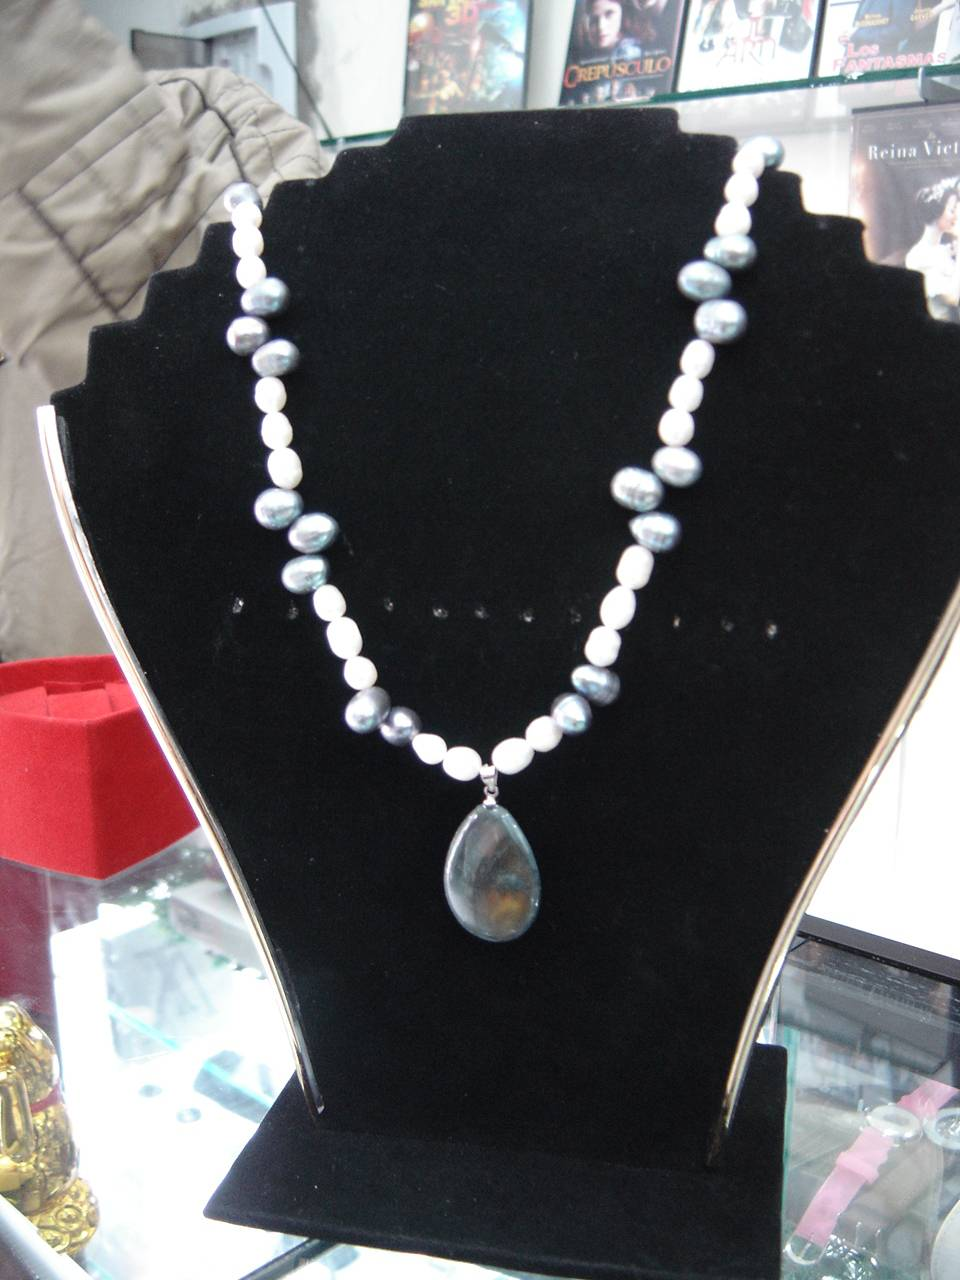 41e59f6e57c5 Collar de Perlas Blancas y grises de rio con broche de plata Julio ...